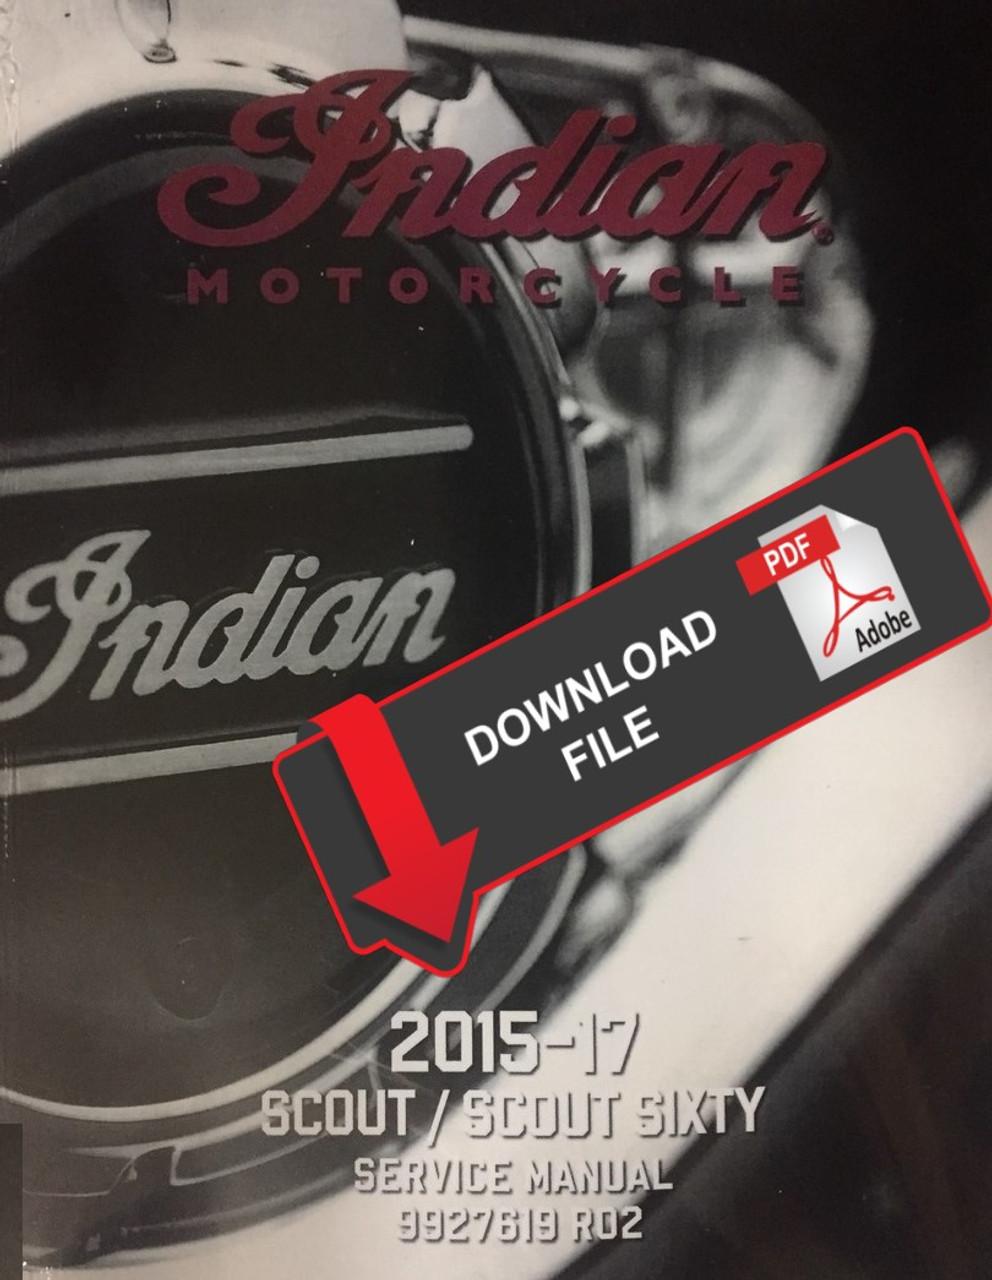 [DIAGRAM_5LK]  Indian Scout 2015 Service Manual | 2015 Indian Scout Wiring Diagram |  | Service Manual Warehouse